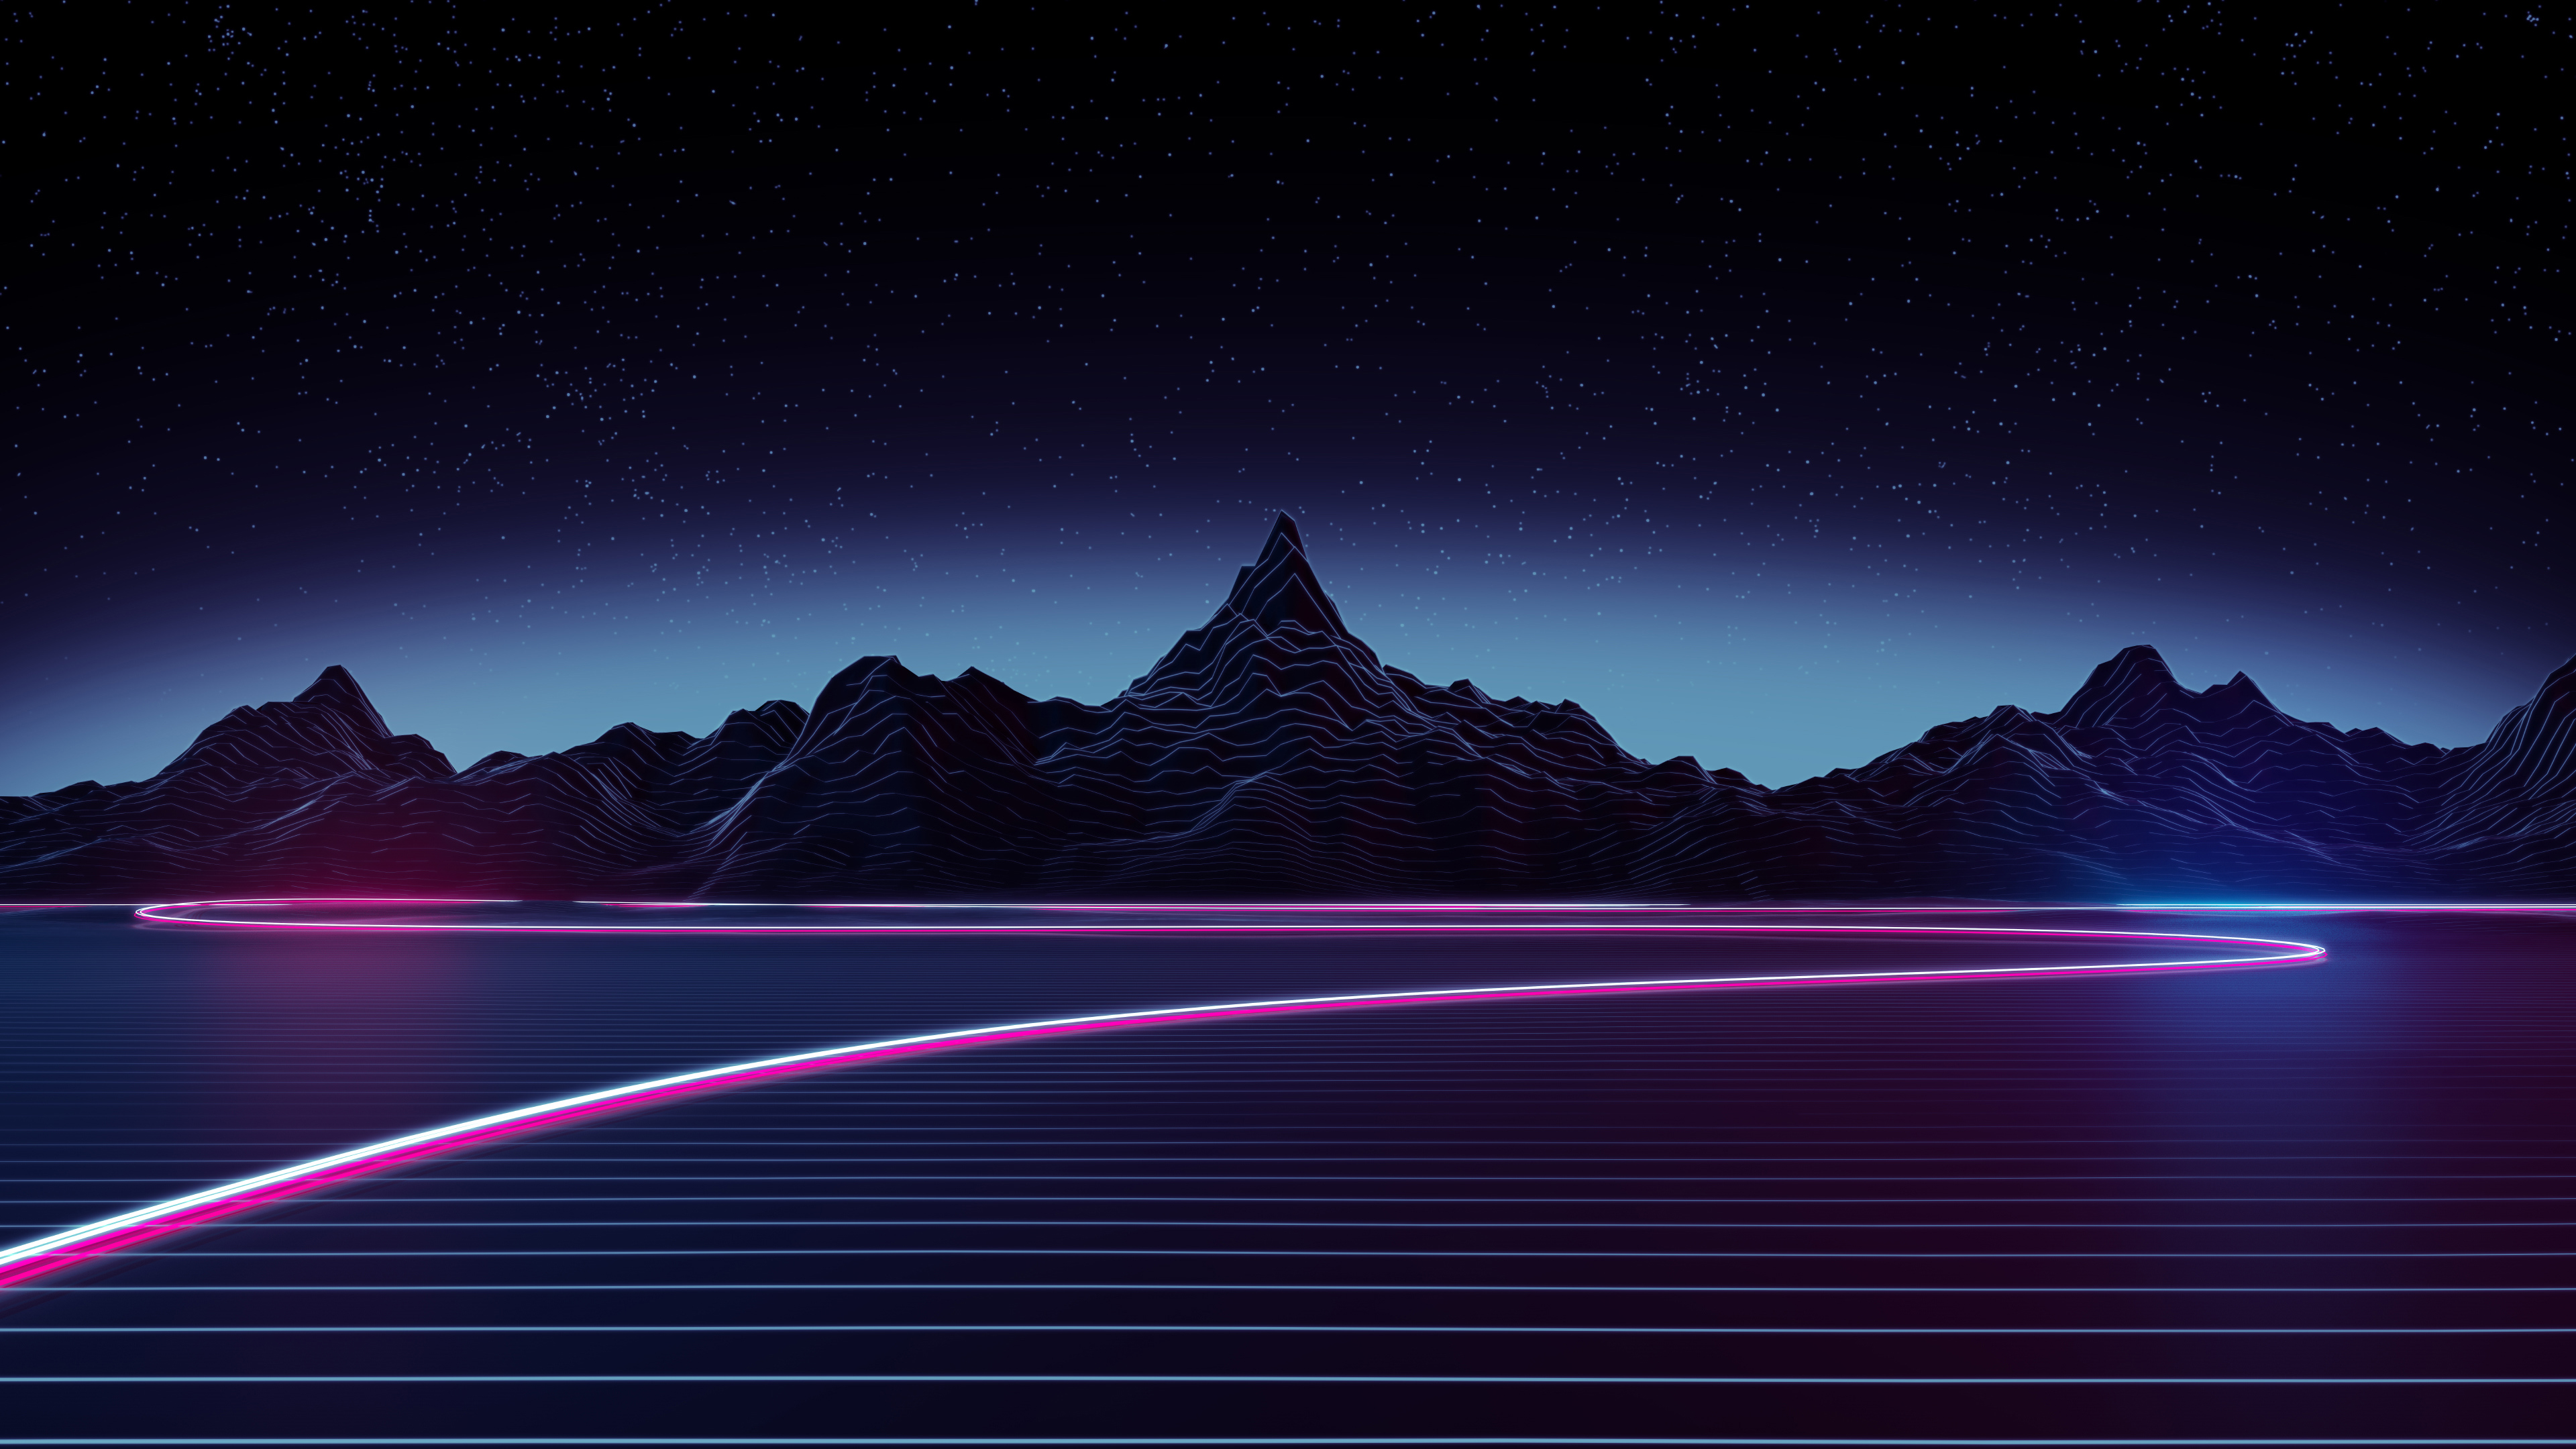 Retro Wave 4k Ultra HD Wallpaper | Background Image ...